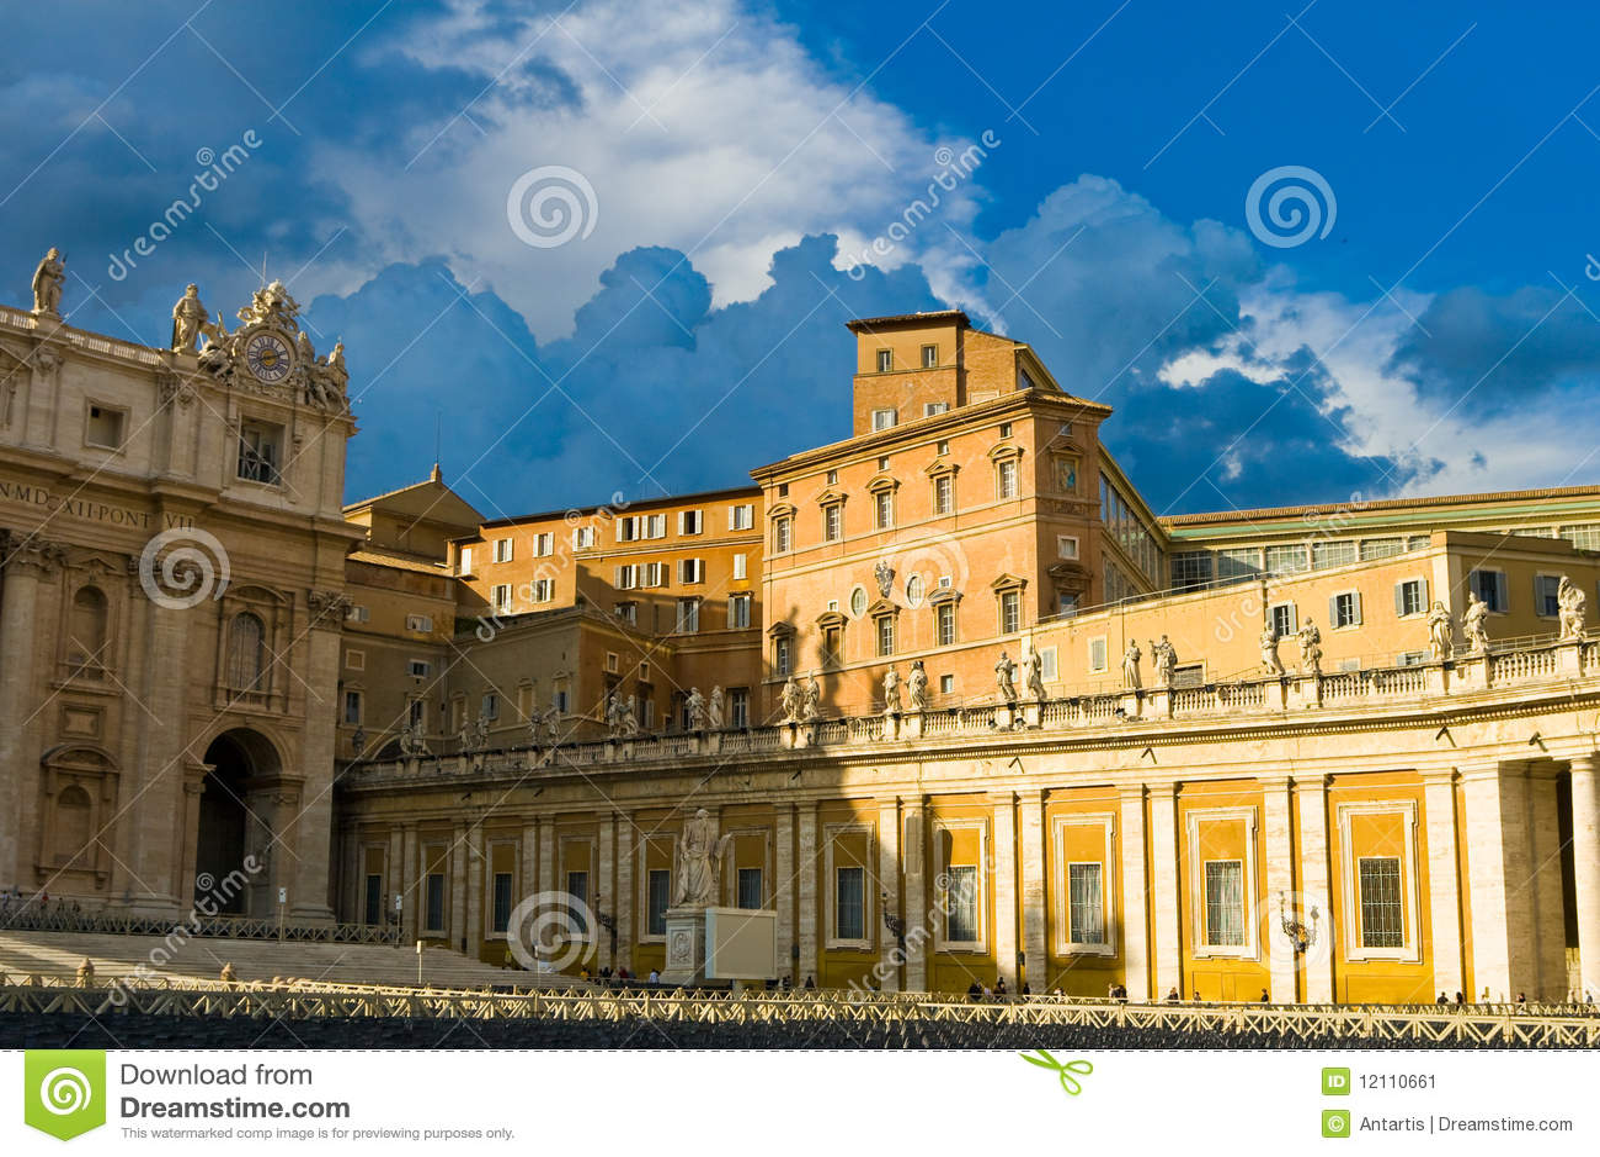 28 papal apartments floor plan papal apartments floor plan